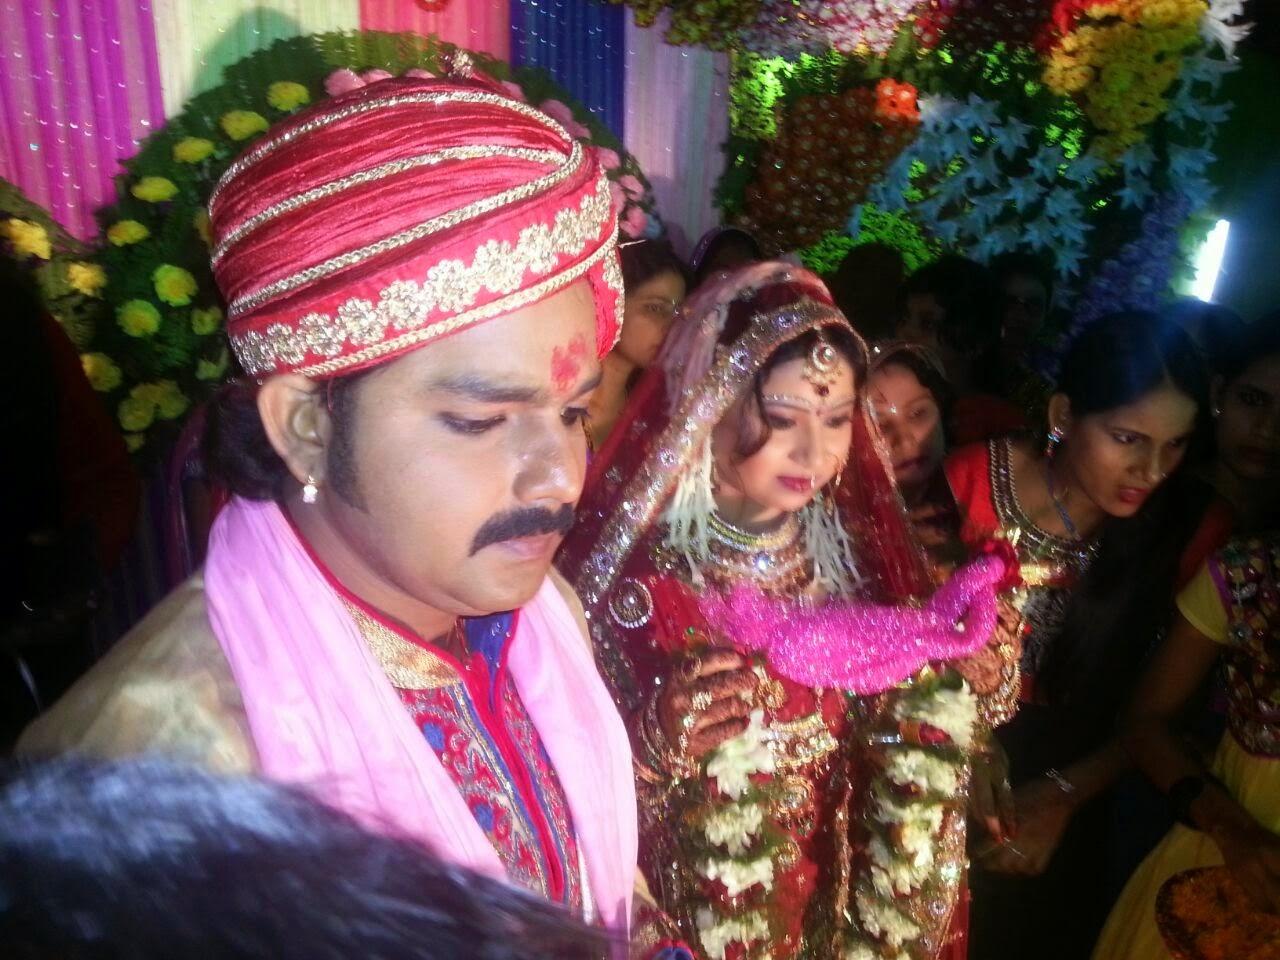 bhojpuri actor Pawan Singh And Neelam Jaimala Ceremony Pictures, photo, image 3